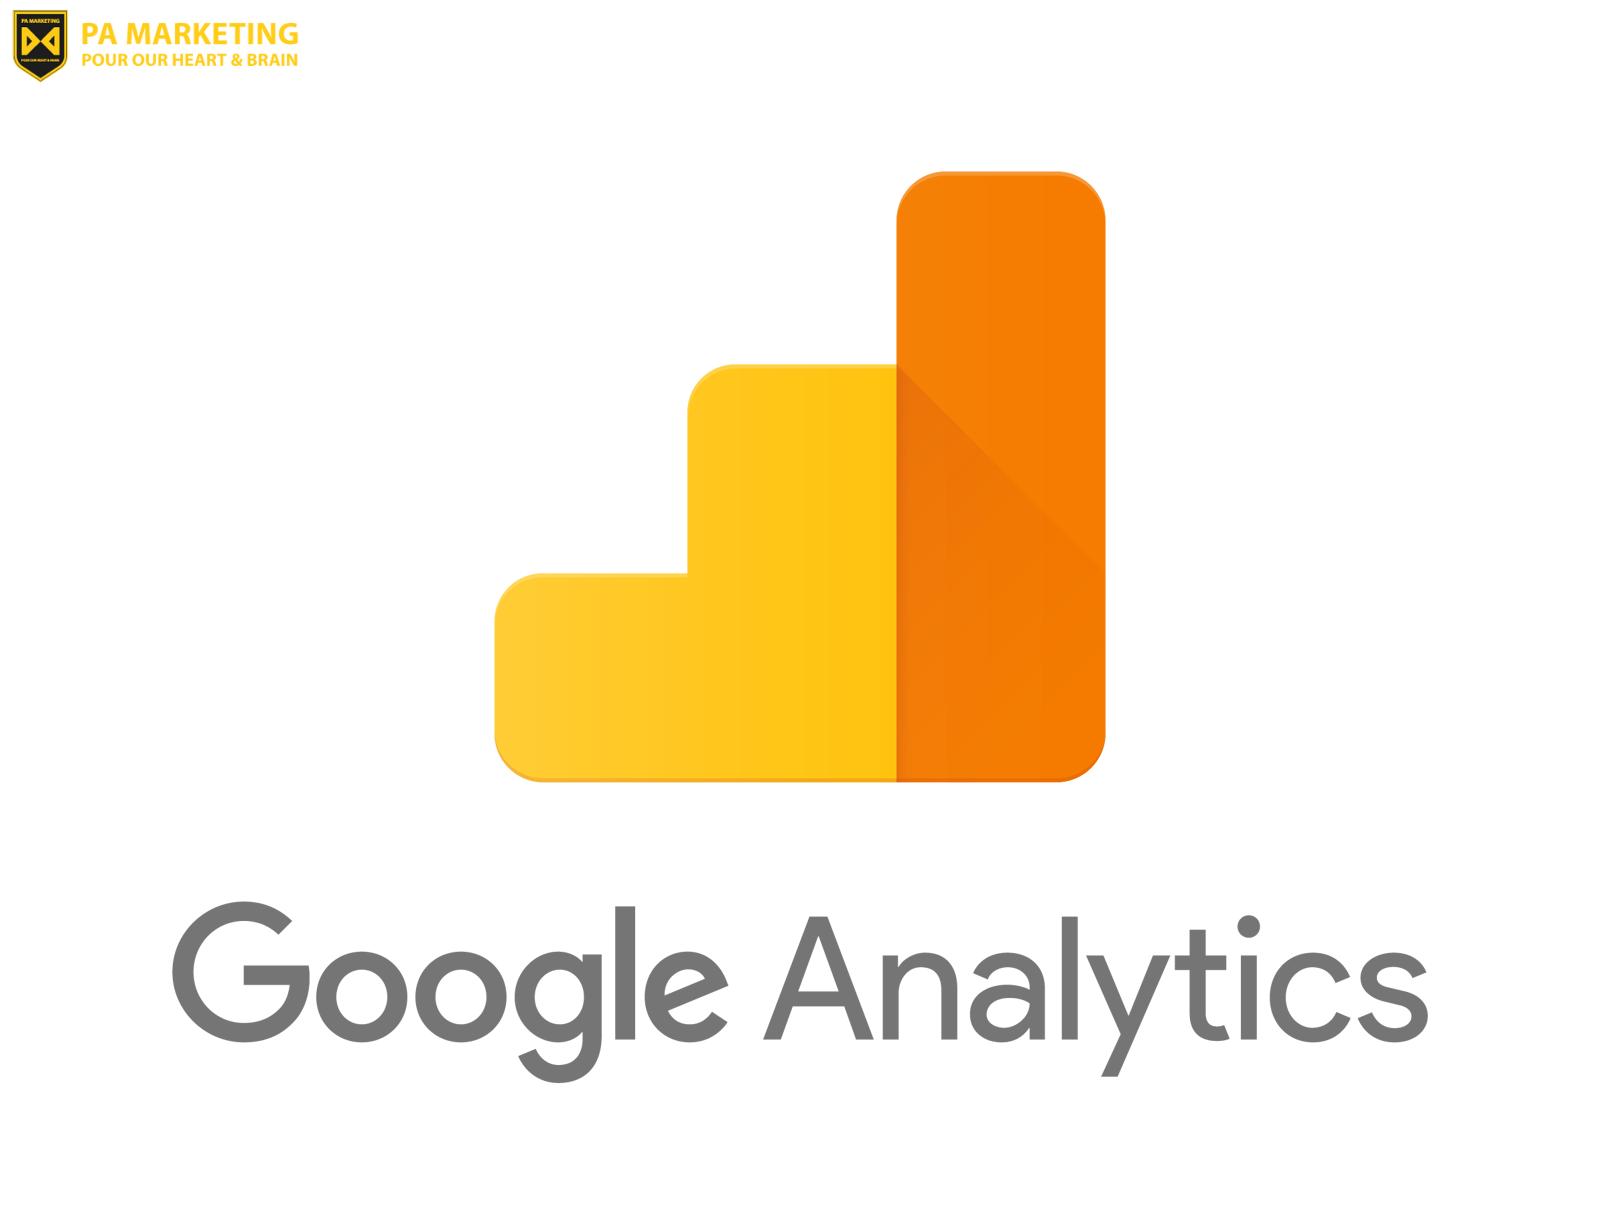 goole analytics - cong cu marketing